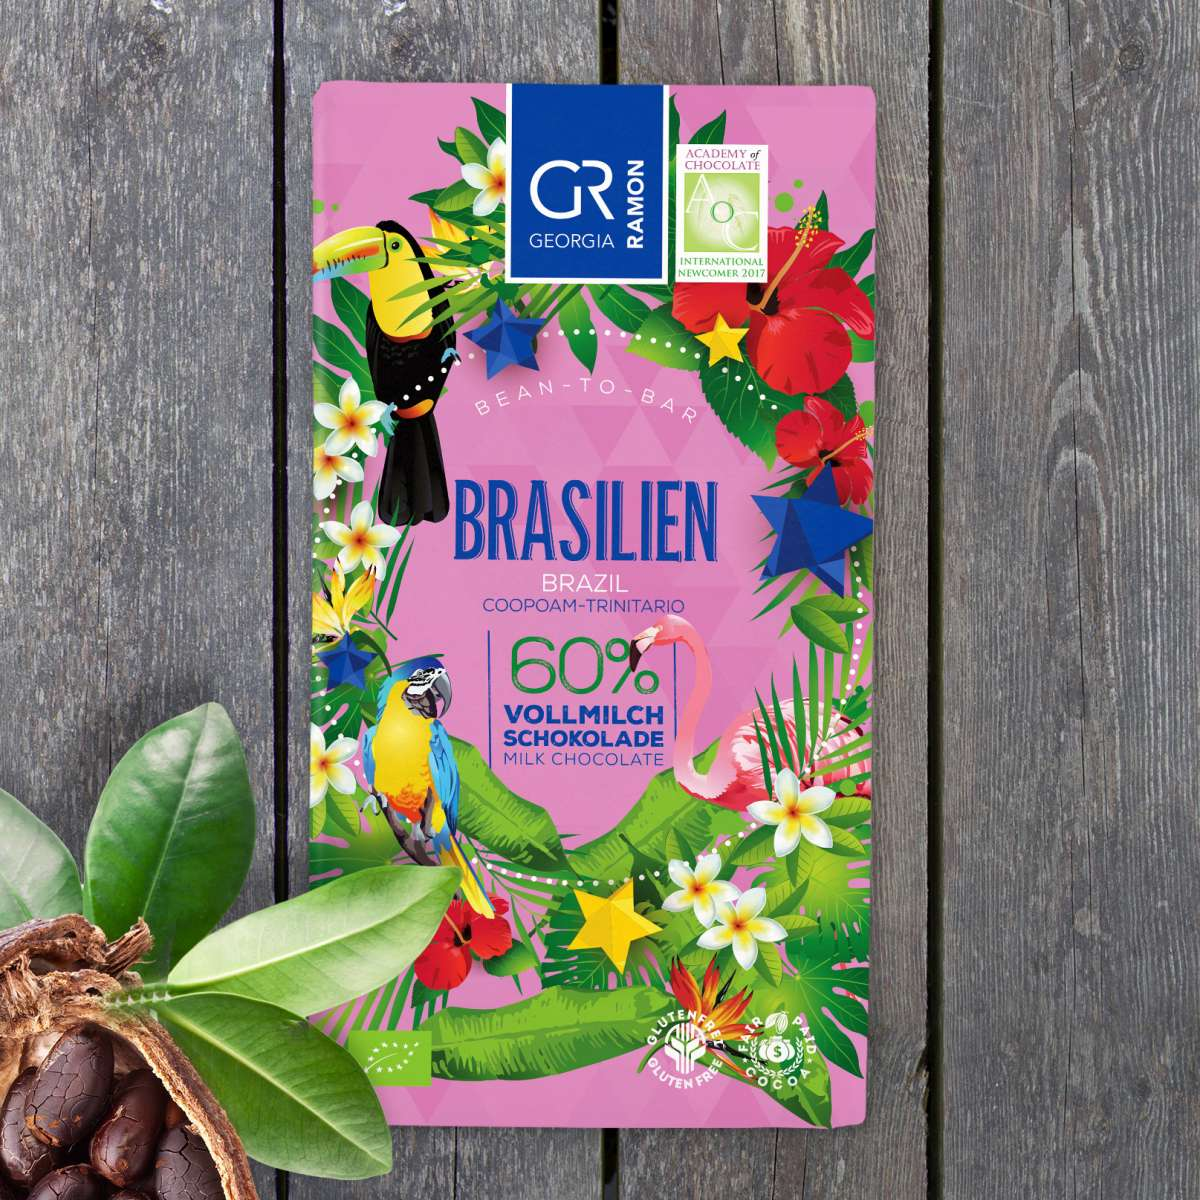 GEORGIA RAMON | Vollmilchschokolade Brasilien 60% | BIO